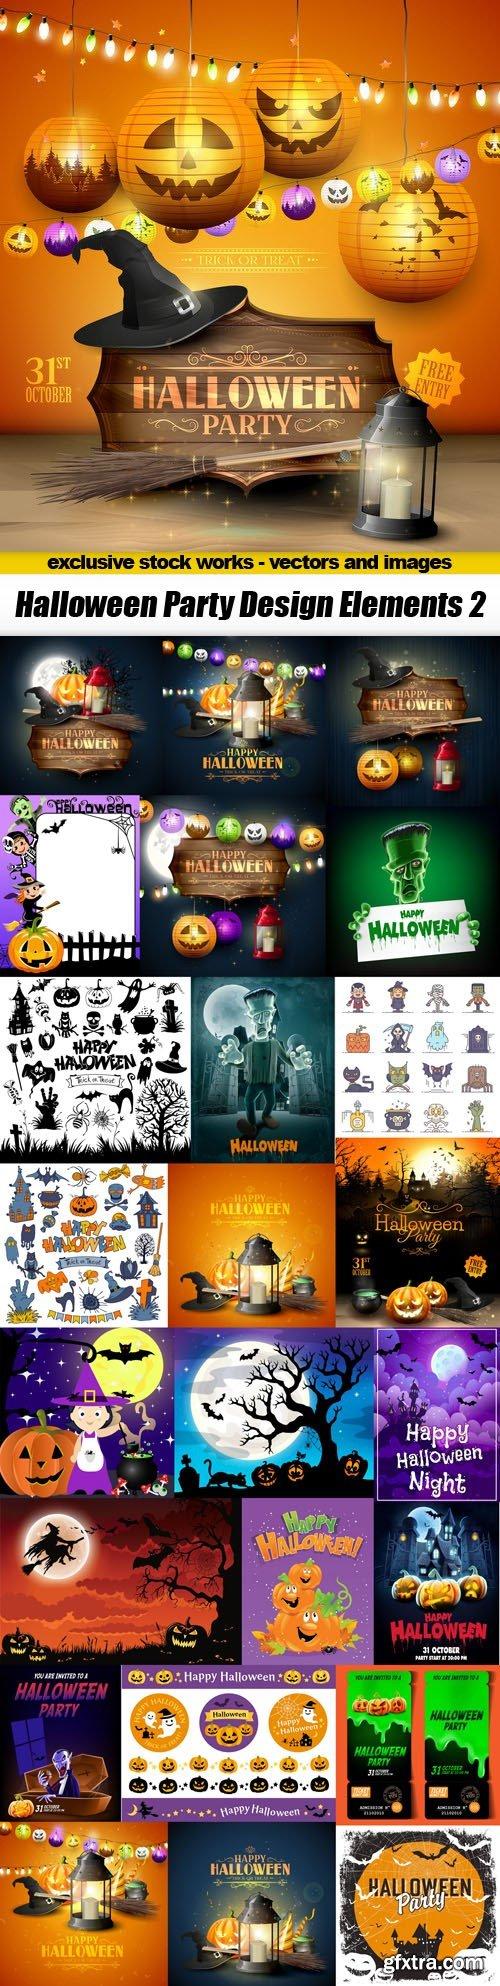 Halloween Party Design Elements 2 - 25xEPS